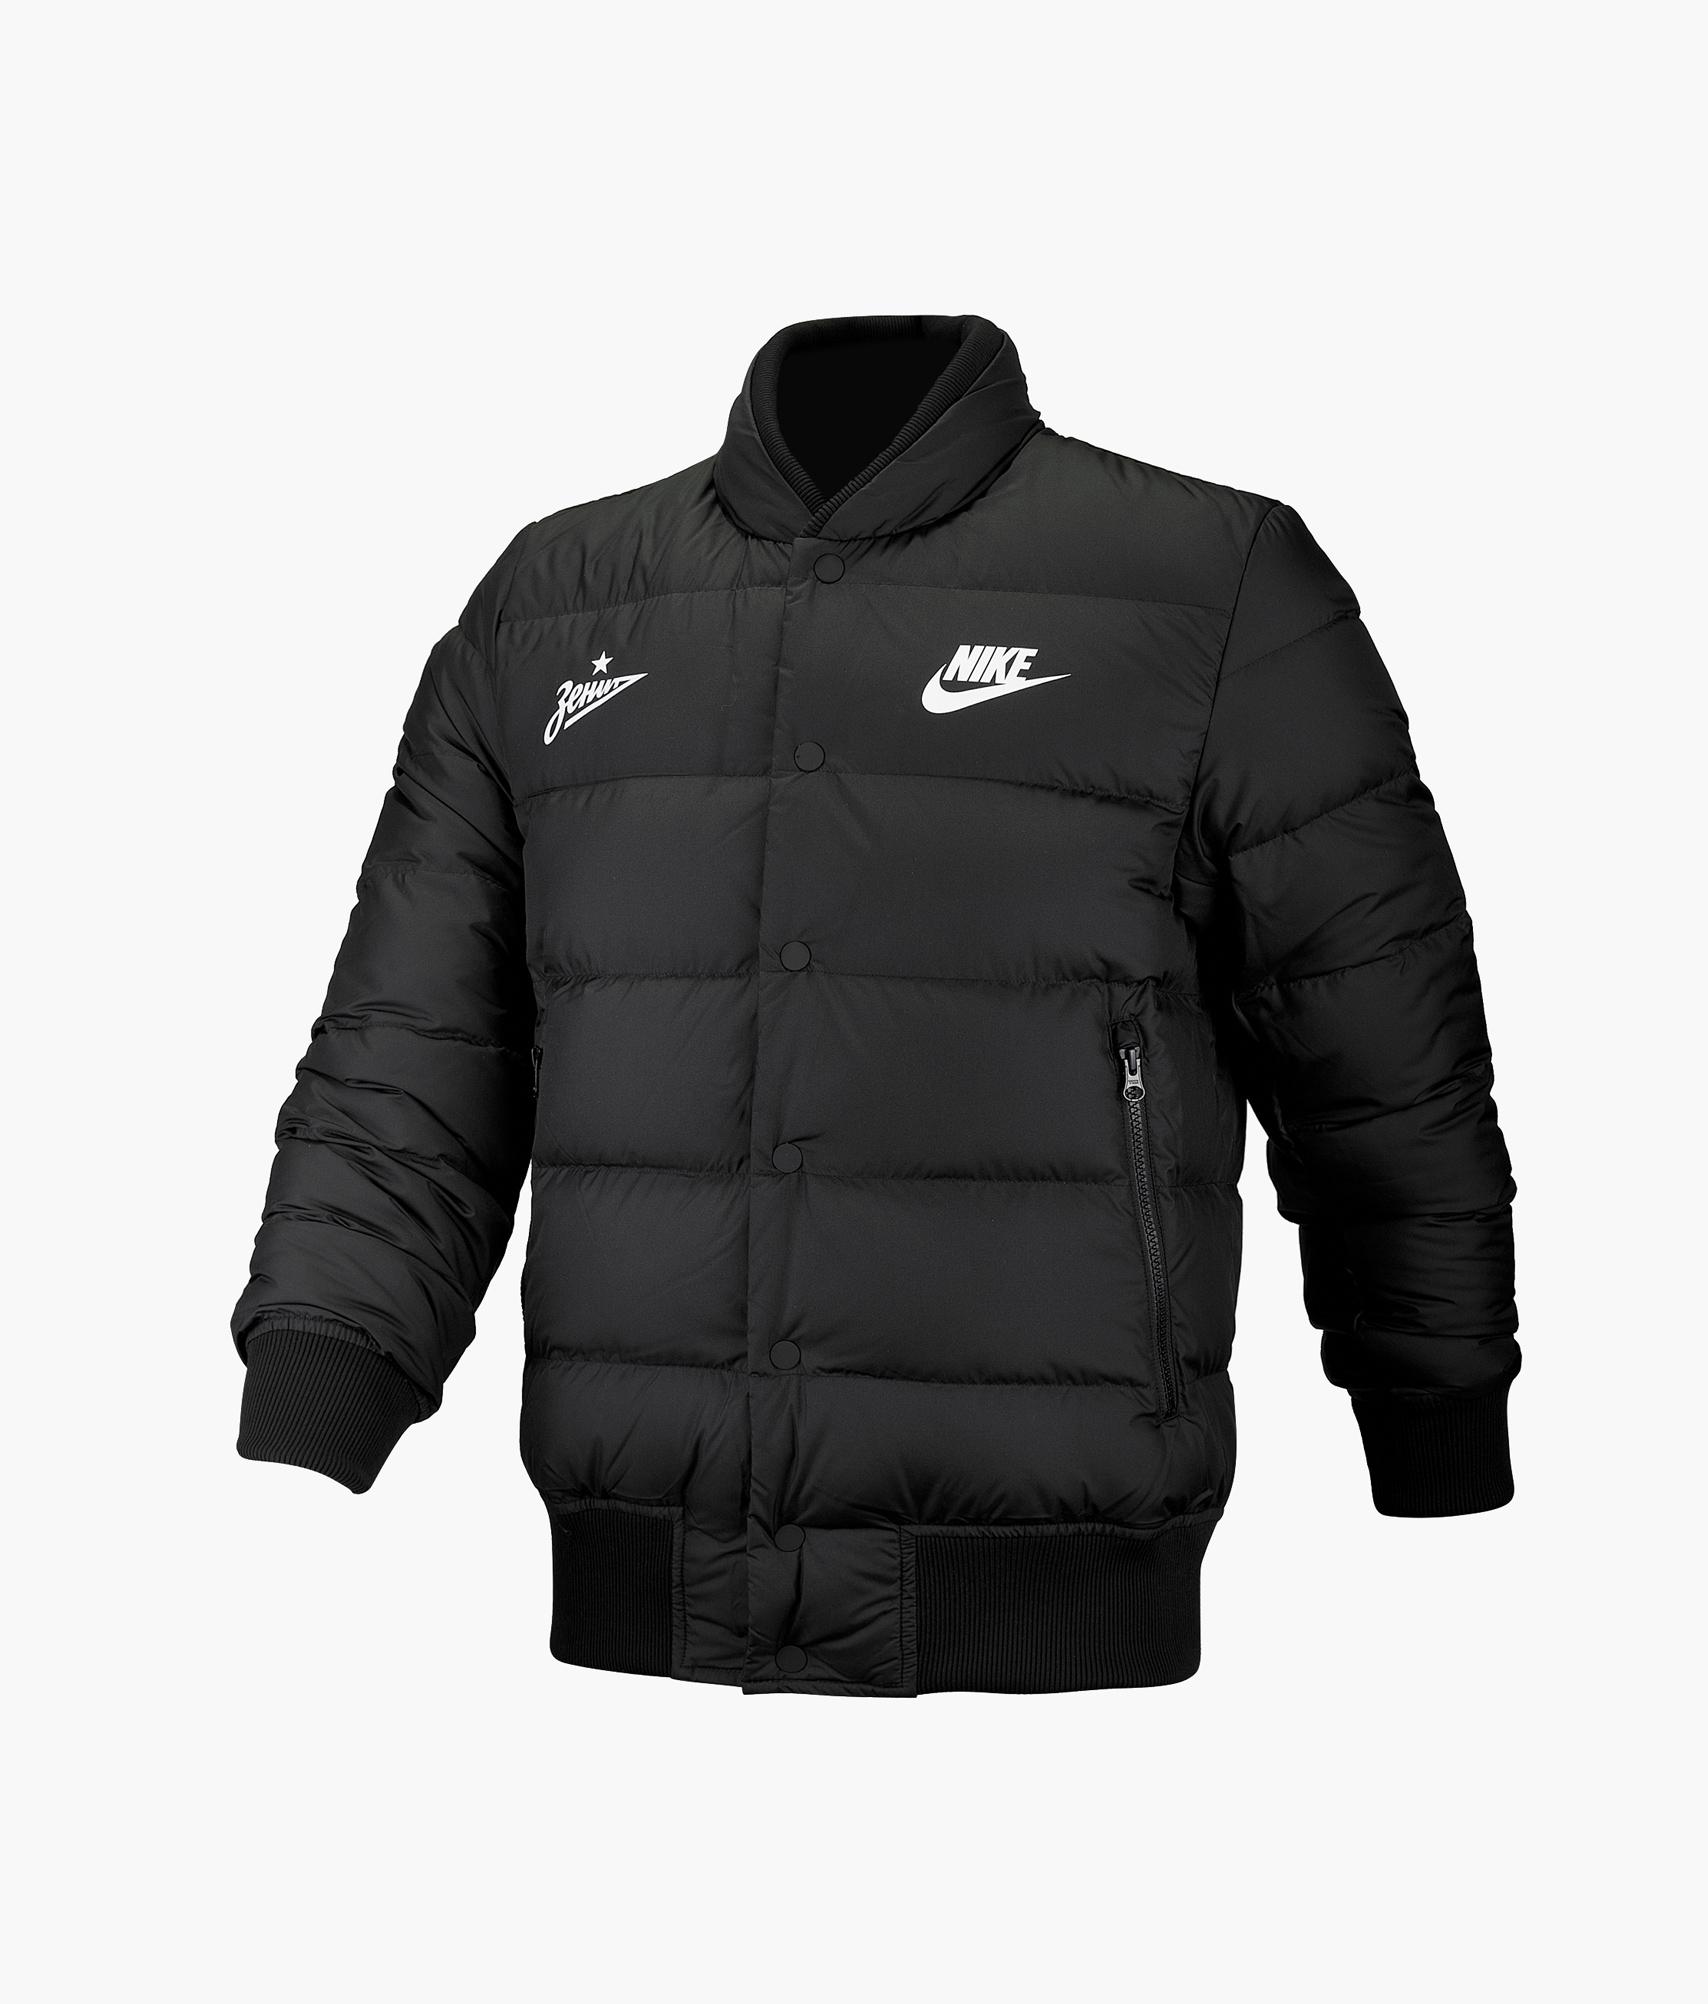 Пуховик-бомбер Nike Цвет-Черный